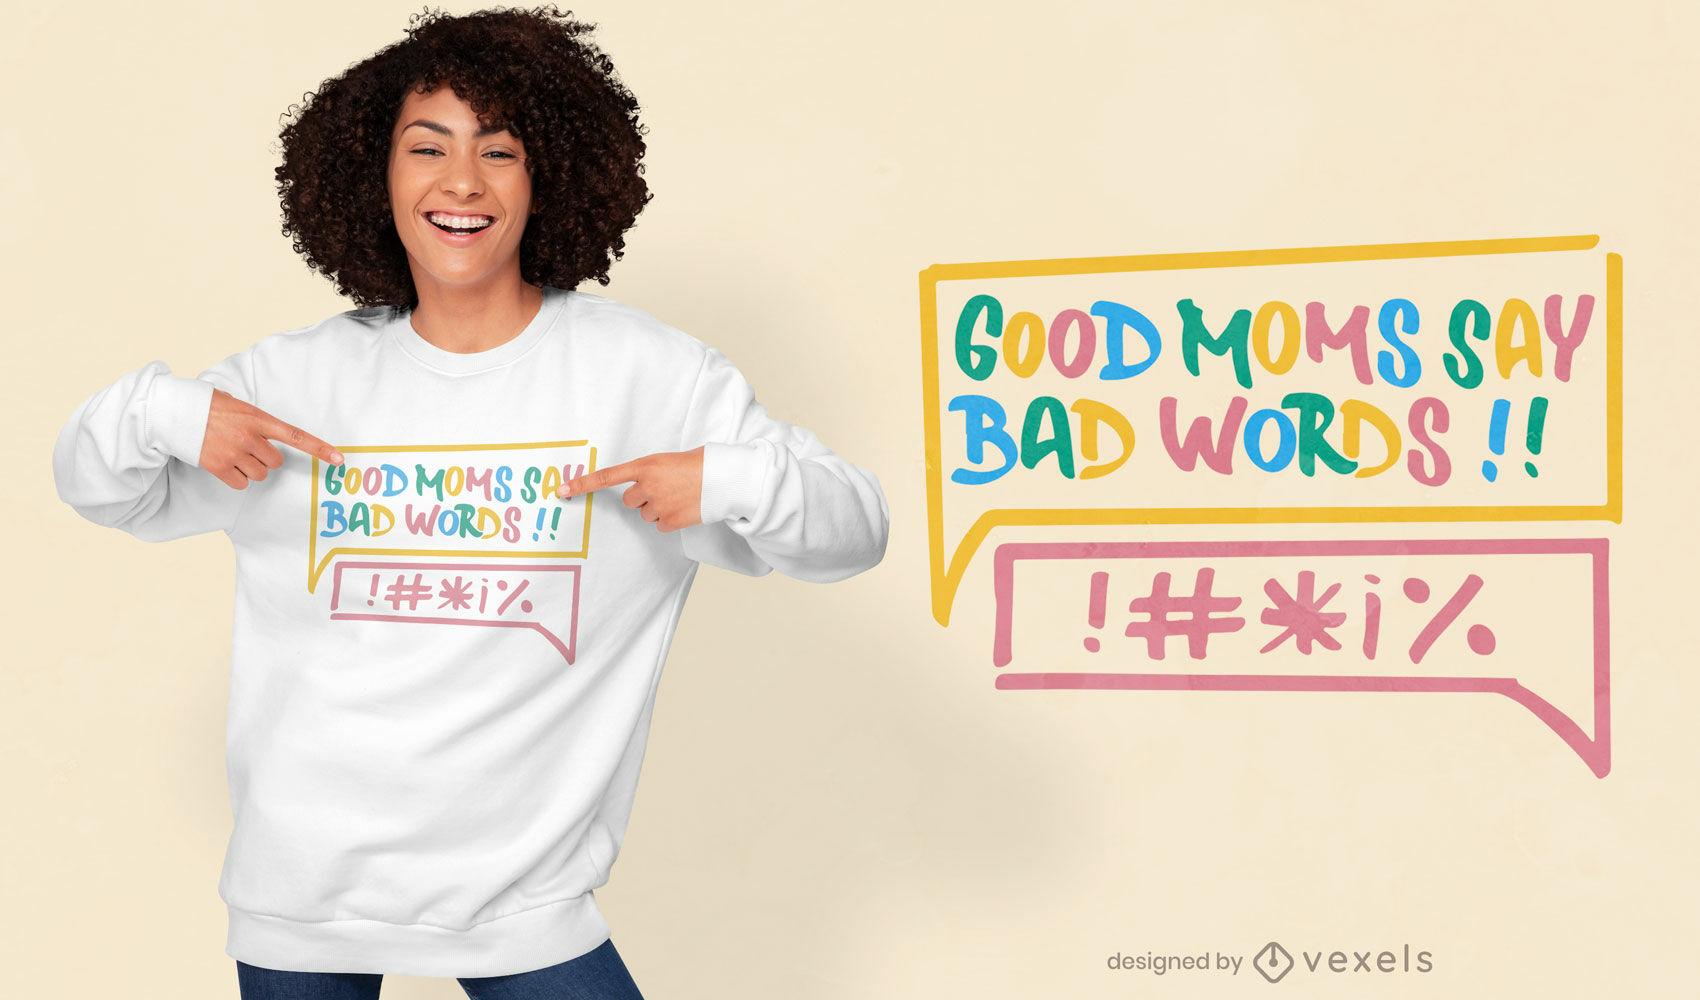 Good mom bad words t-shirt design